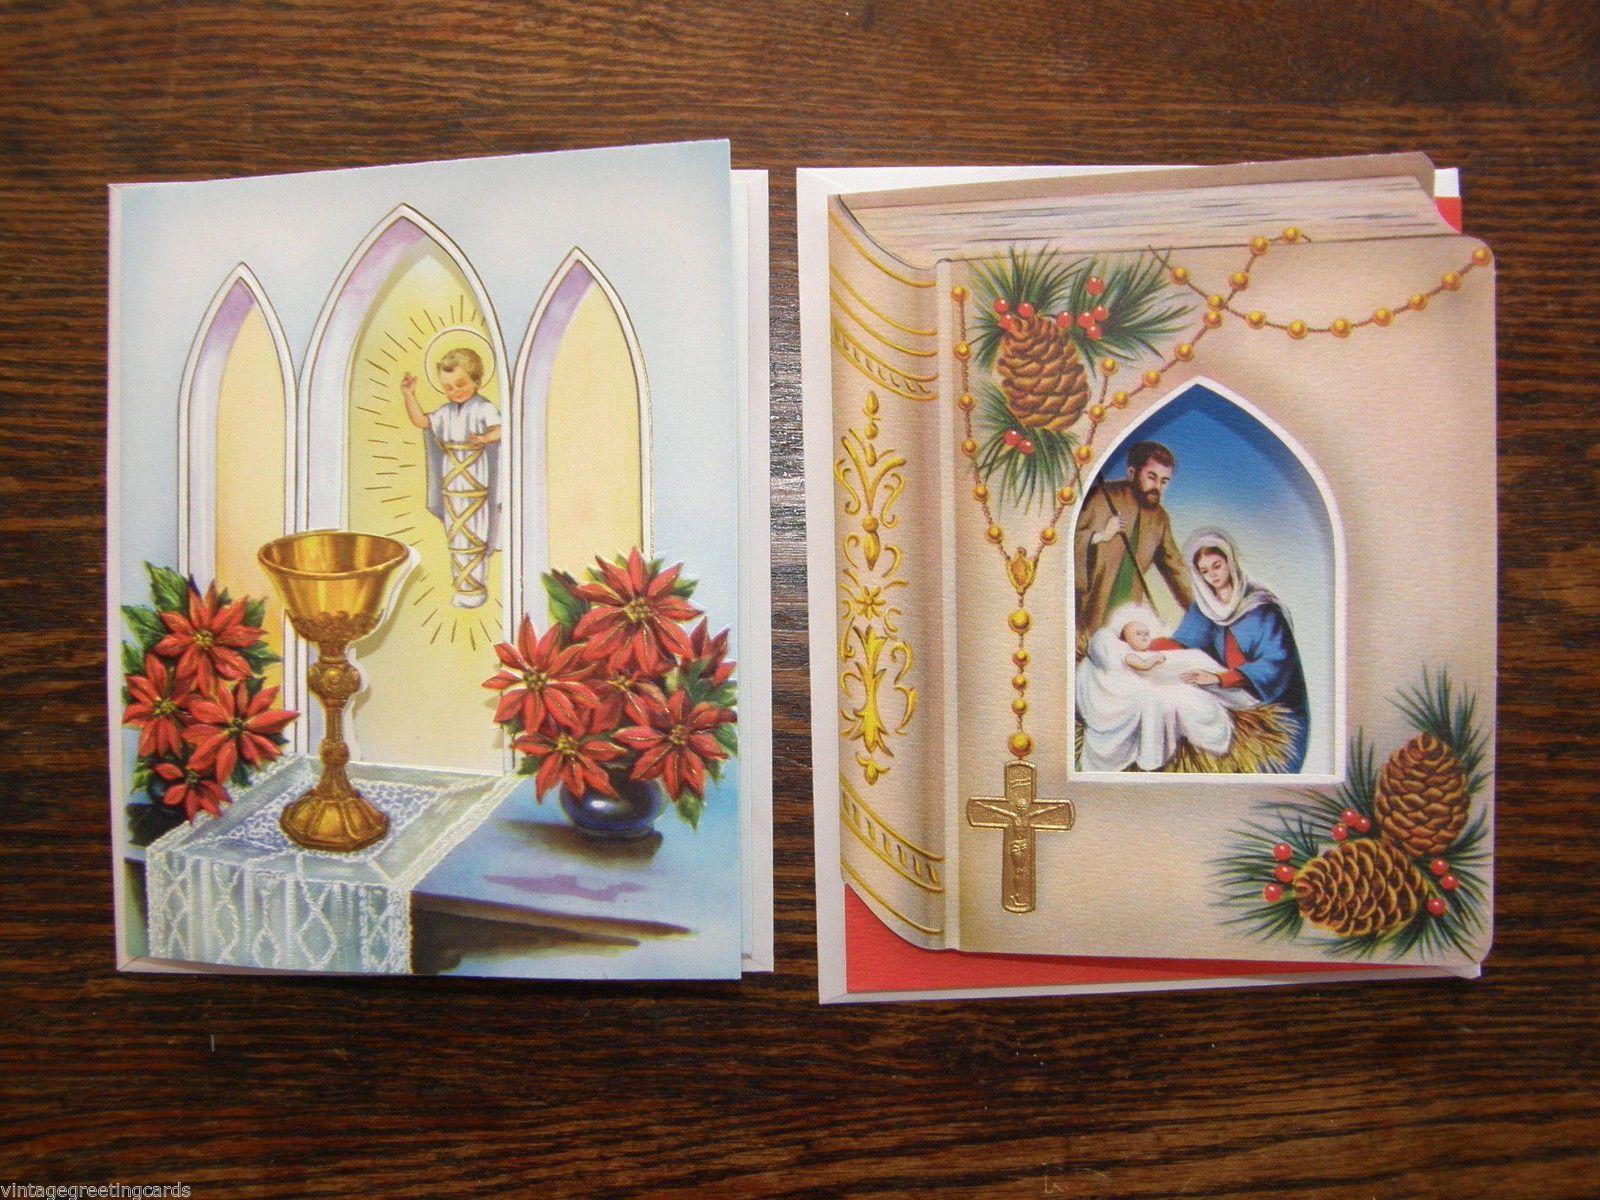 49 Vintage 1950s Religious Christmas Cards Mint Unused Wth Envelopes ...